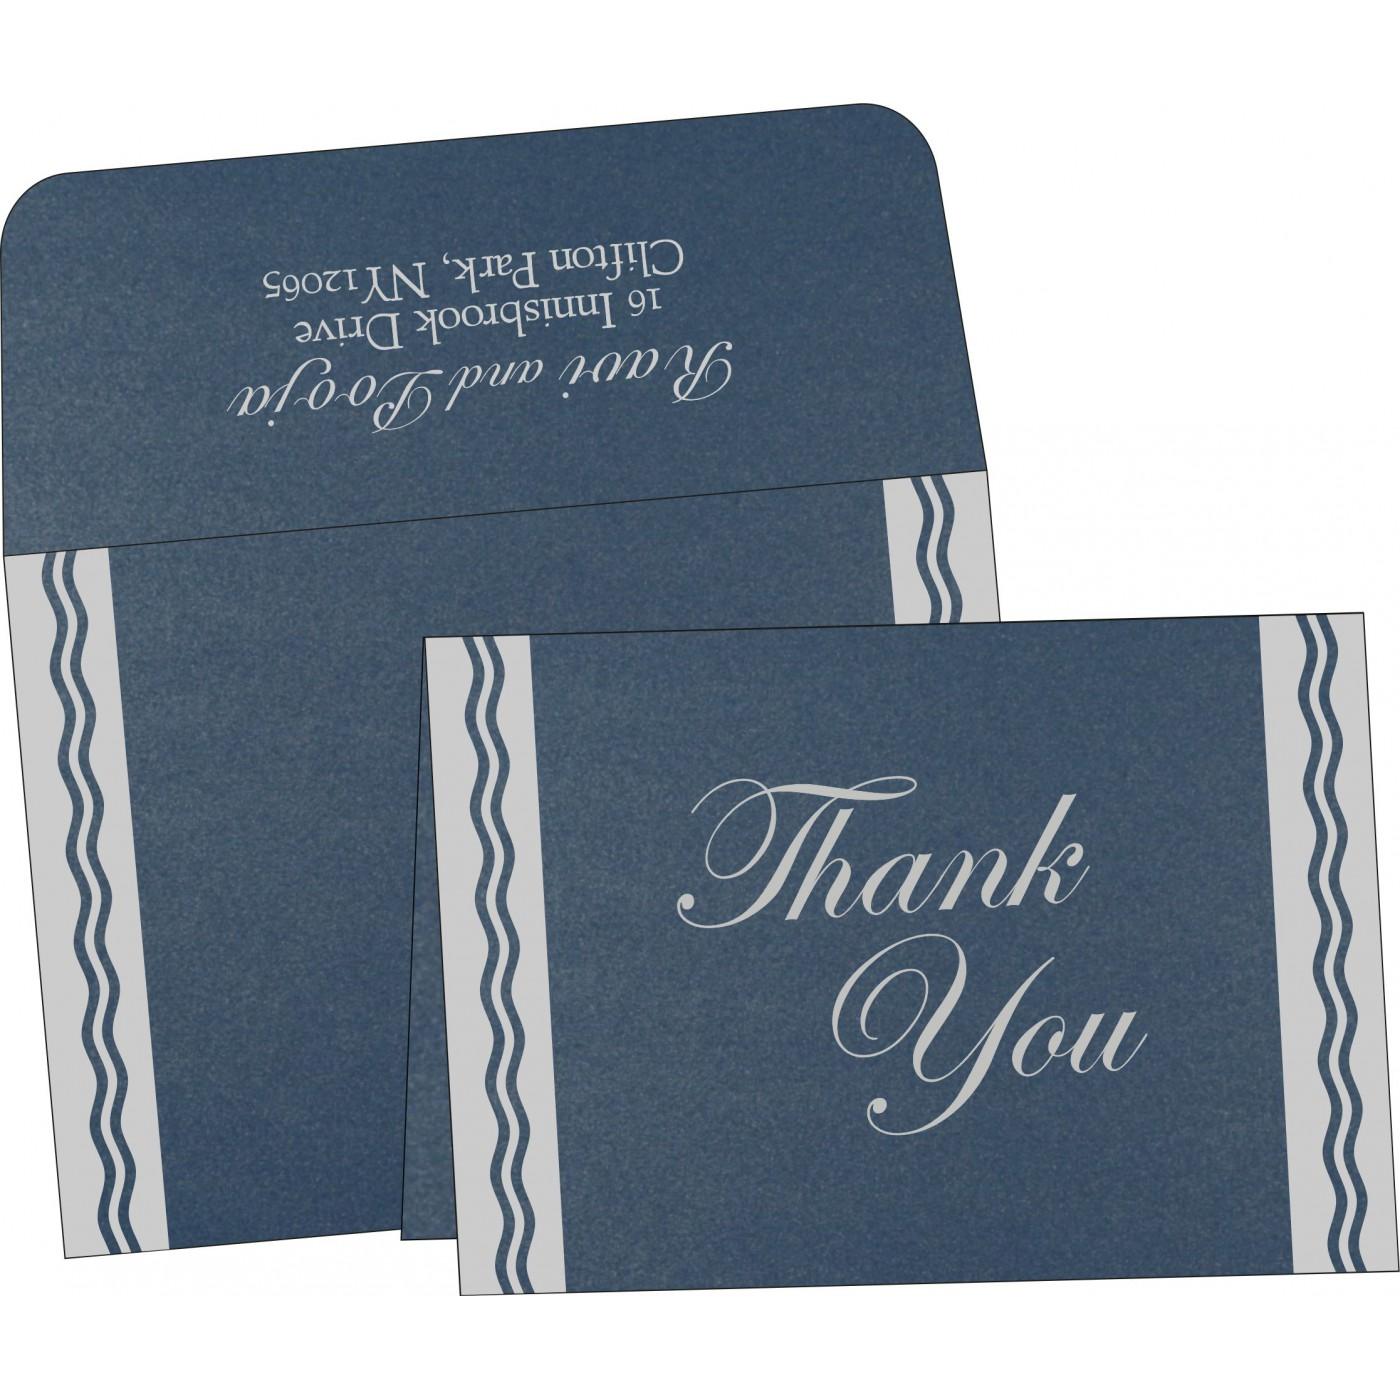 Thank You Cards : TYC-2179 - 123WeddingCards